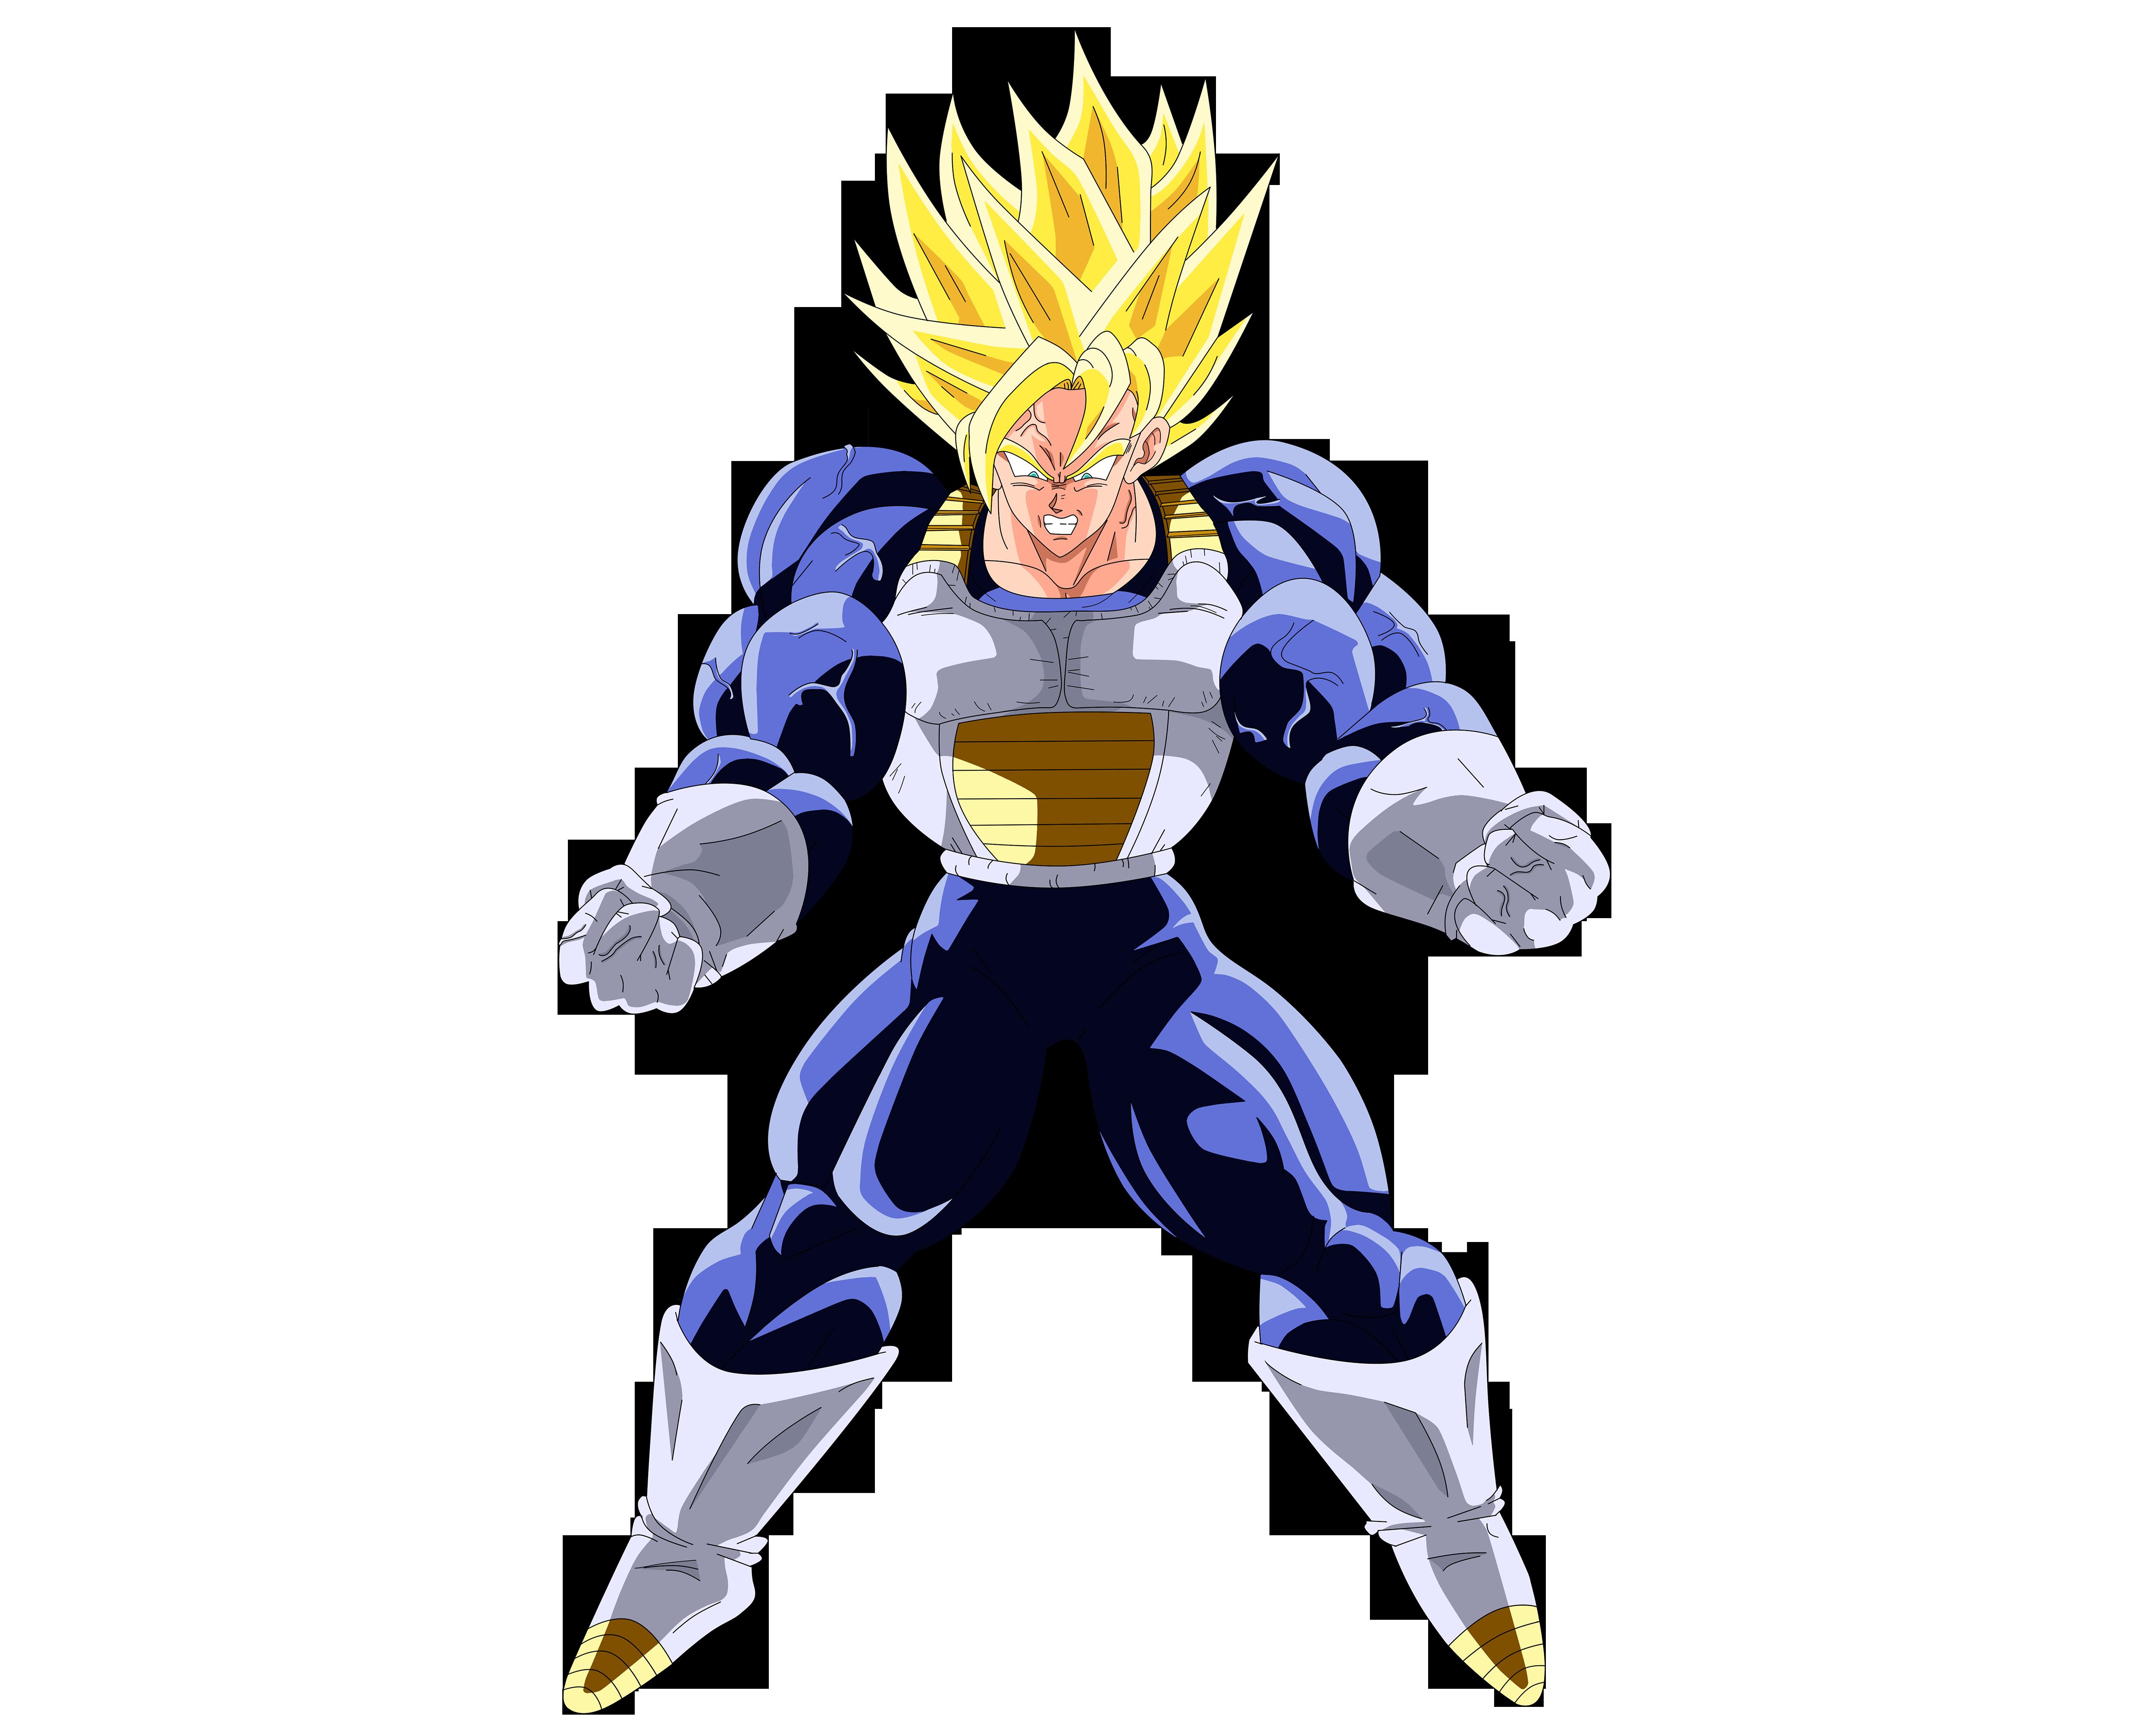 Goku 4k ultra hd fond d 39 cran and arri re plan 5000x4000 for Fond ecran goku